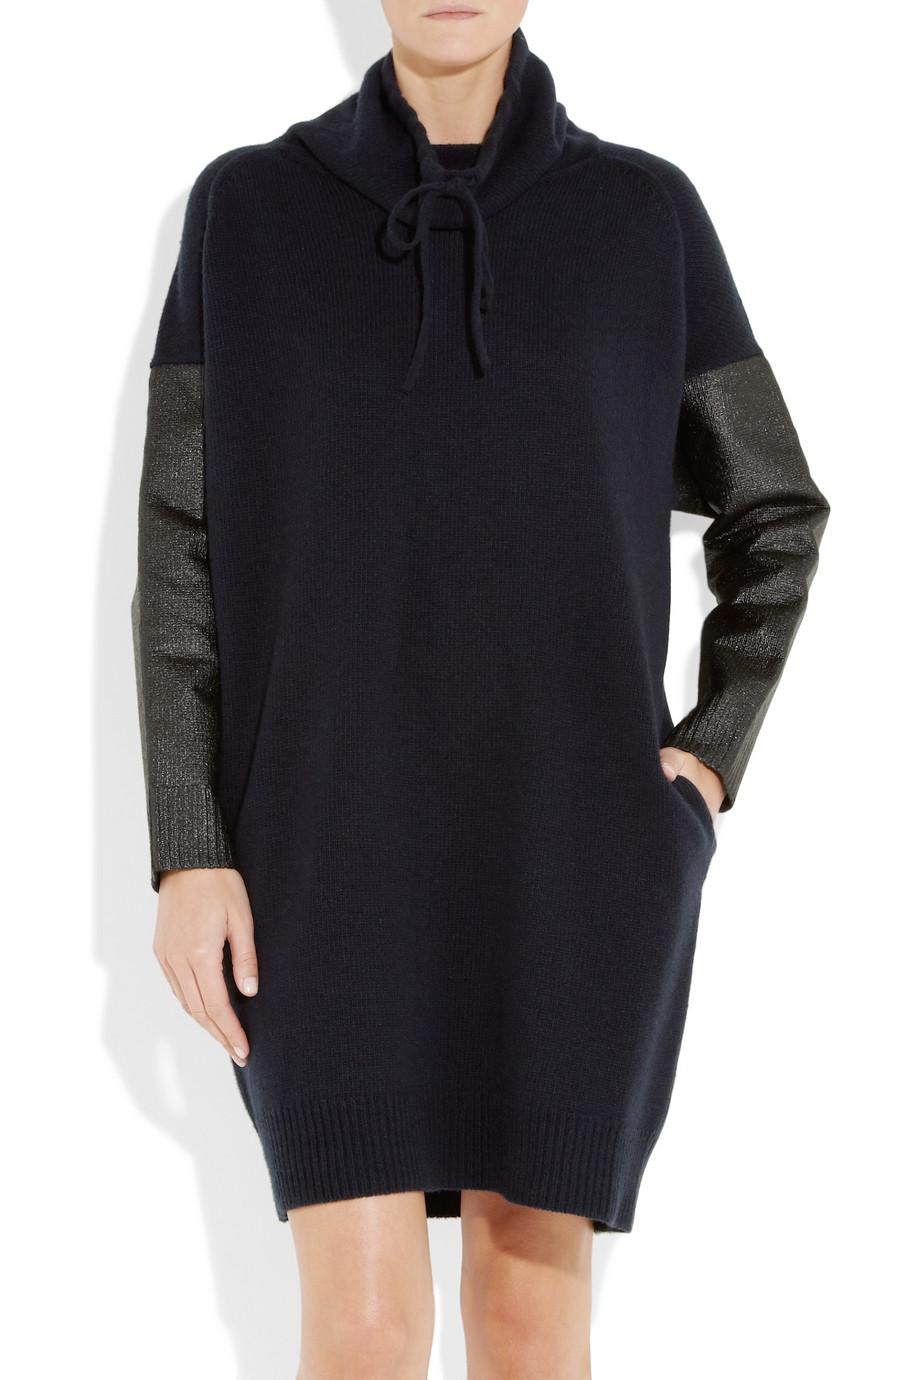 Rachel Roy Sweater Dress